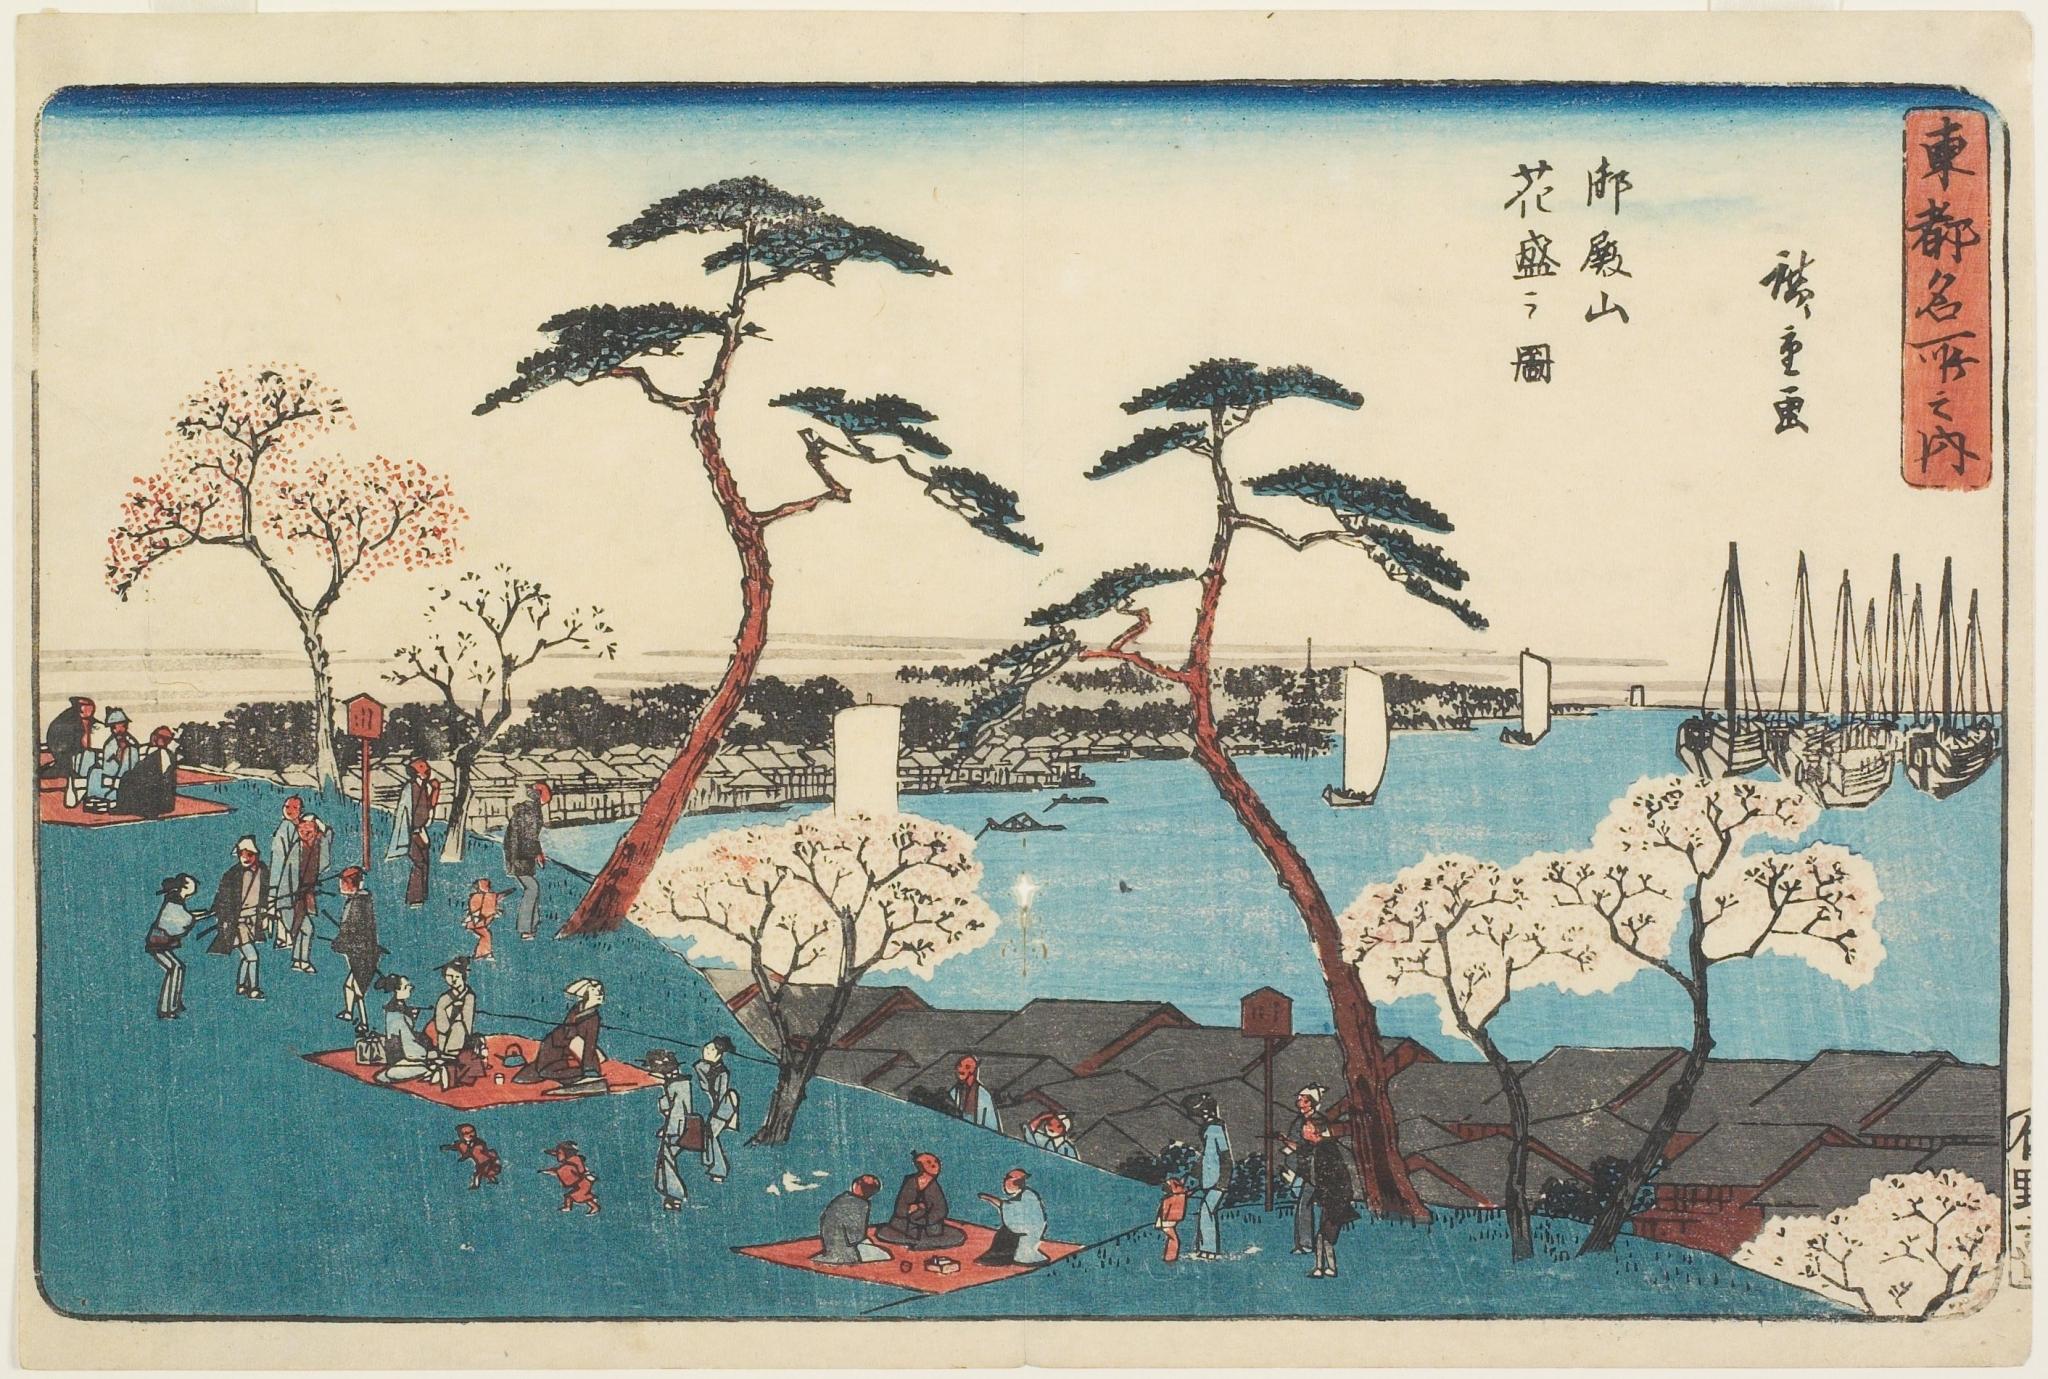 Japanese Woodblock Prints by Hiroshige